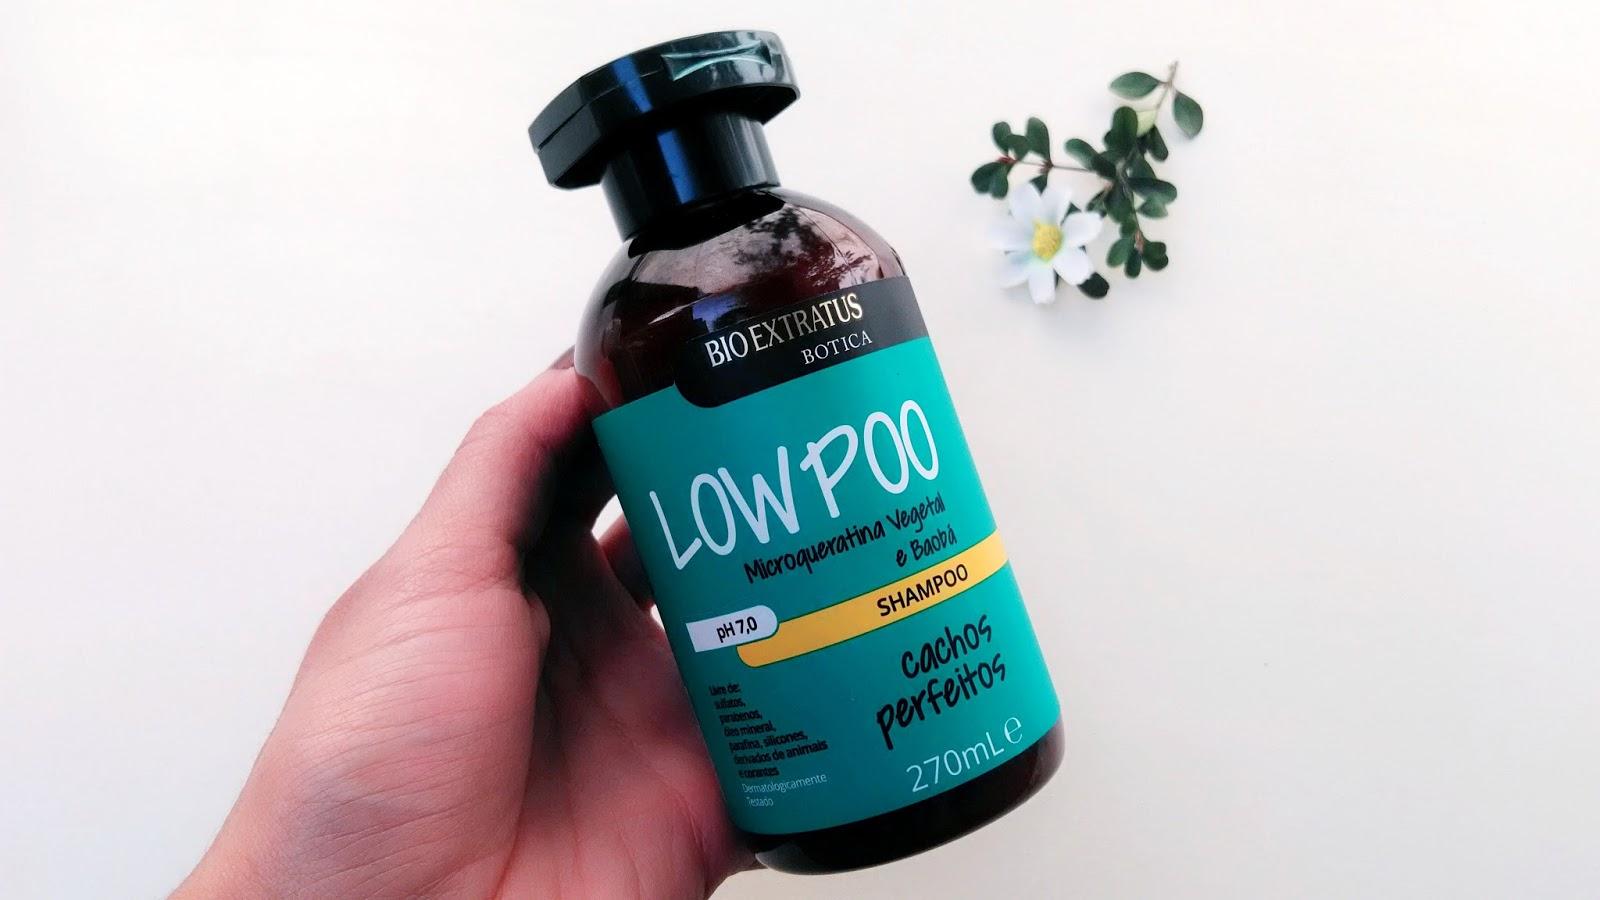 botica cachos shampoo low poo bio extratus resenha